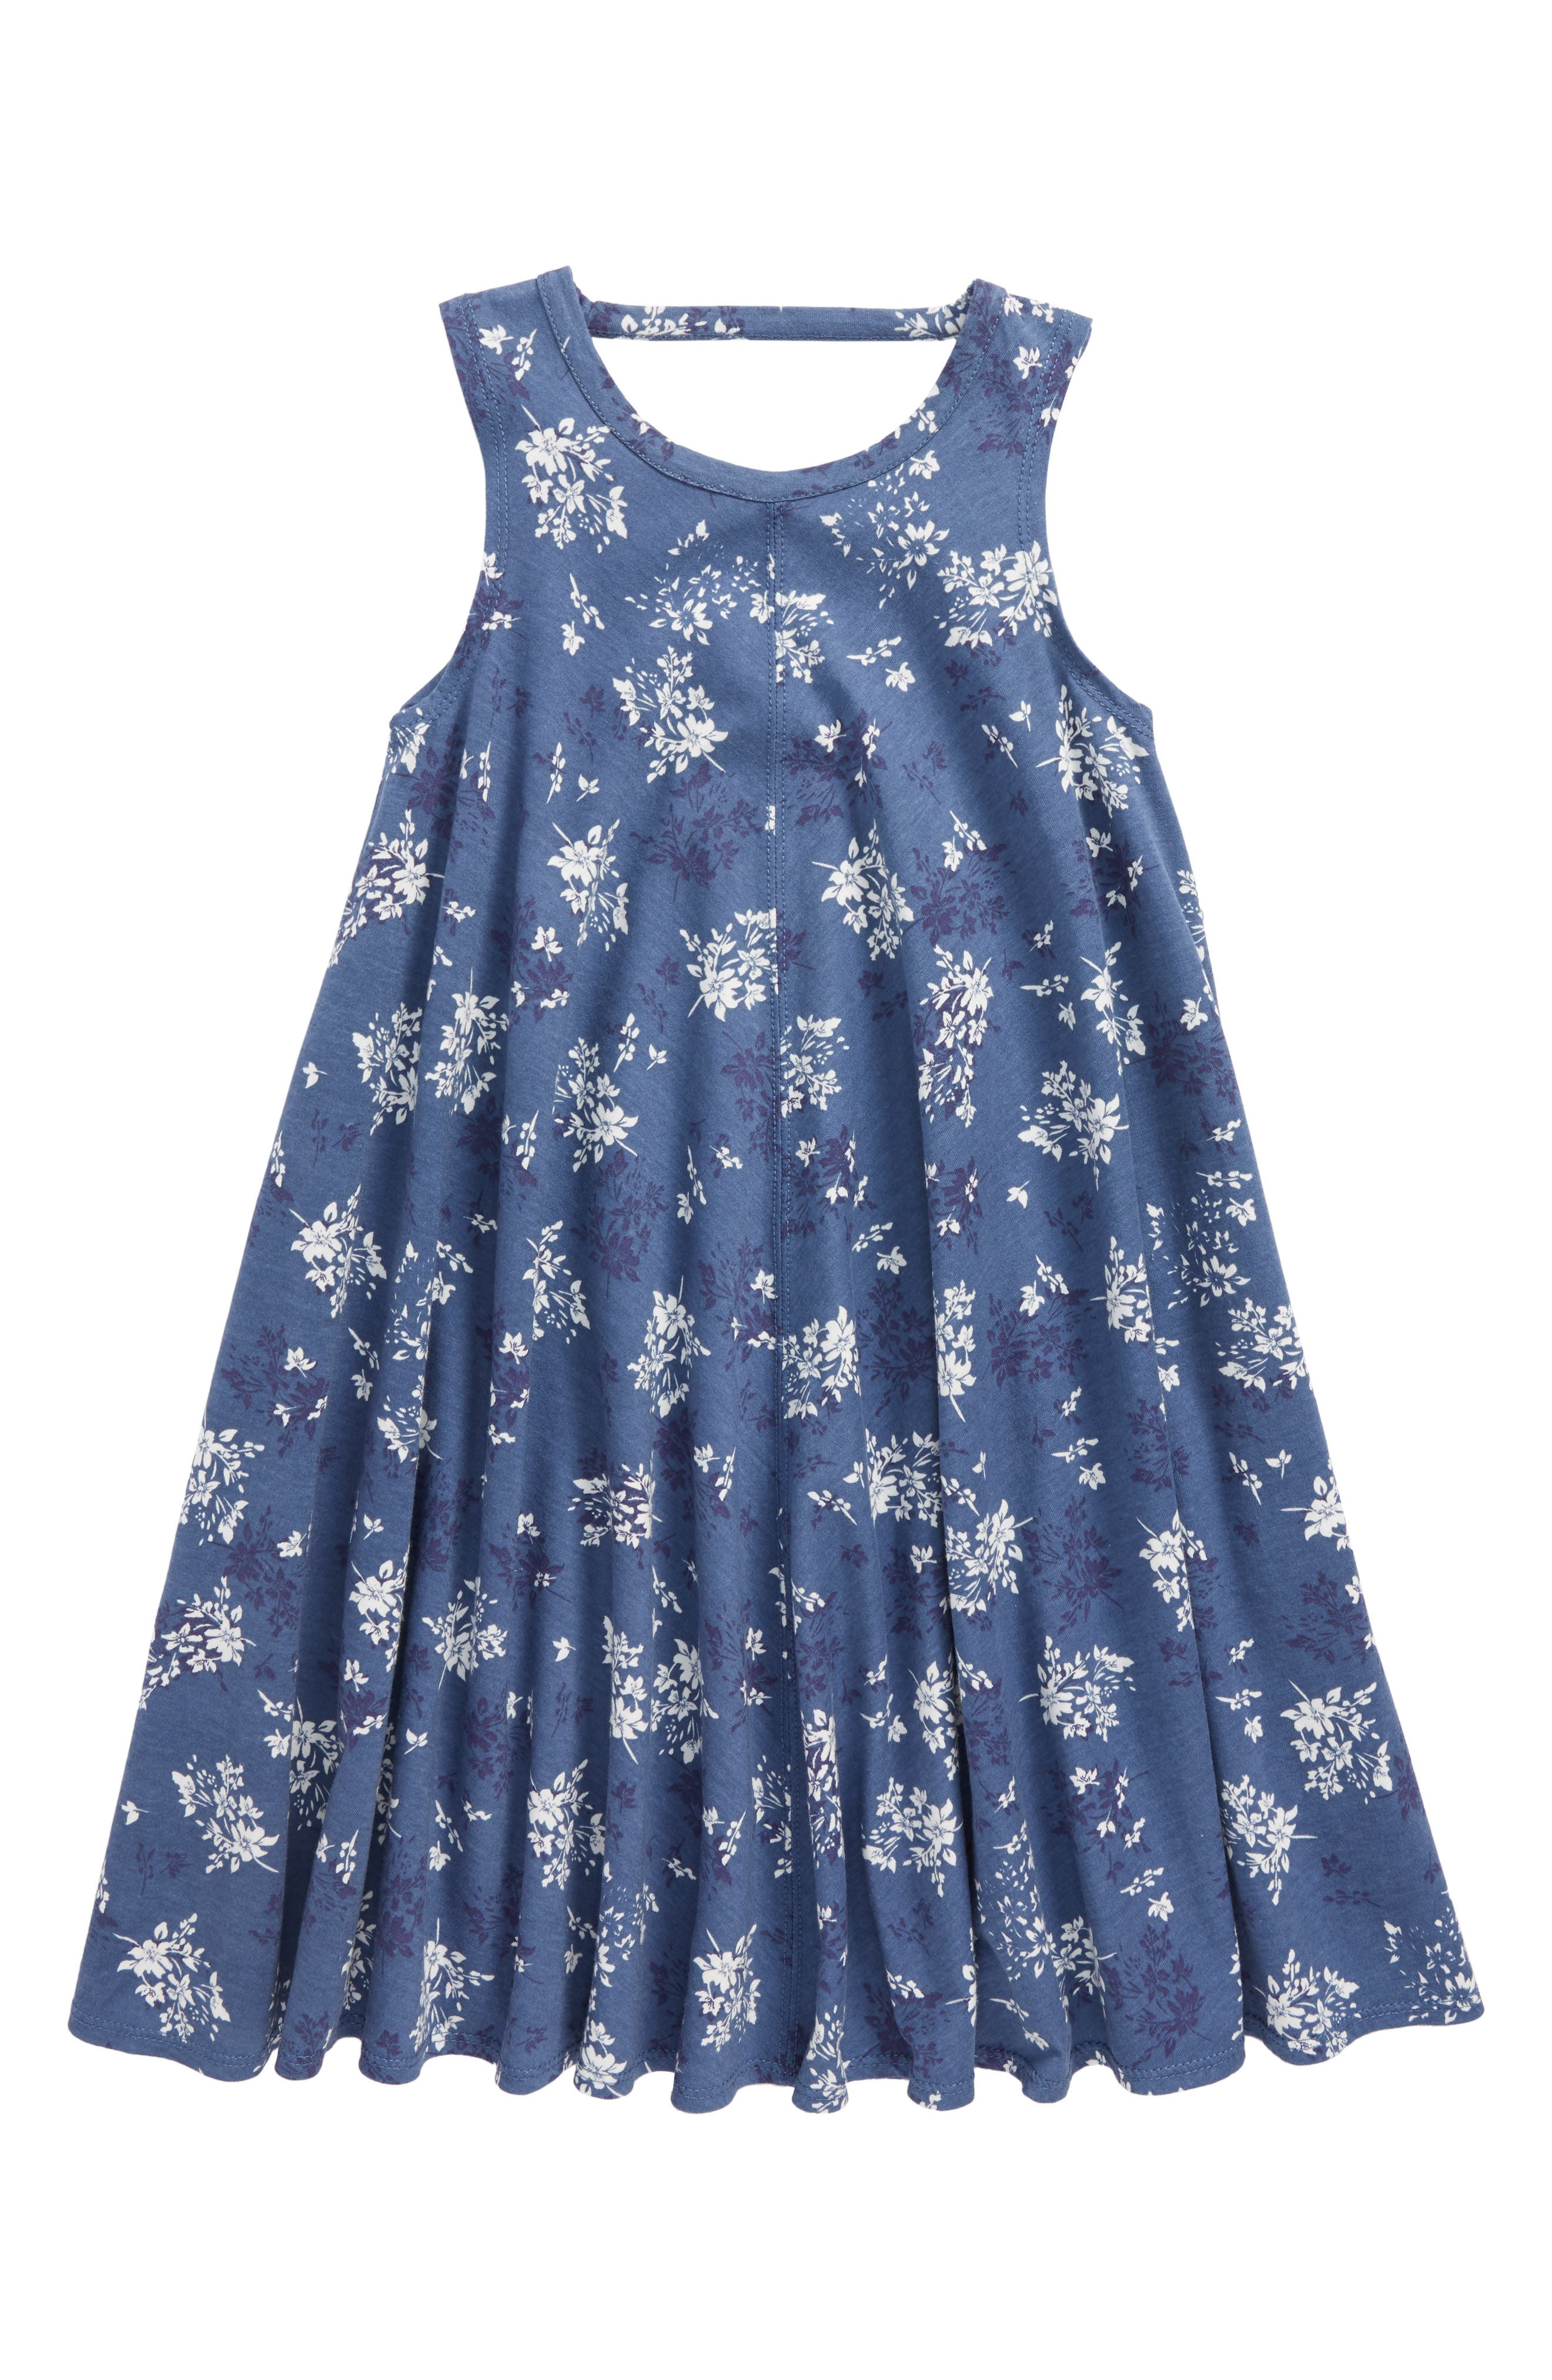 Alternate Image 1 Selected - Tucker + Tate Cotton Swing Dress (Big Girls)